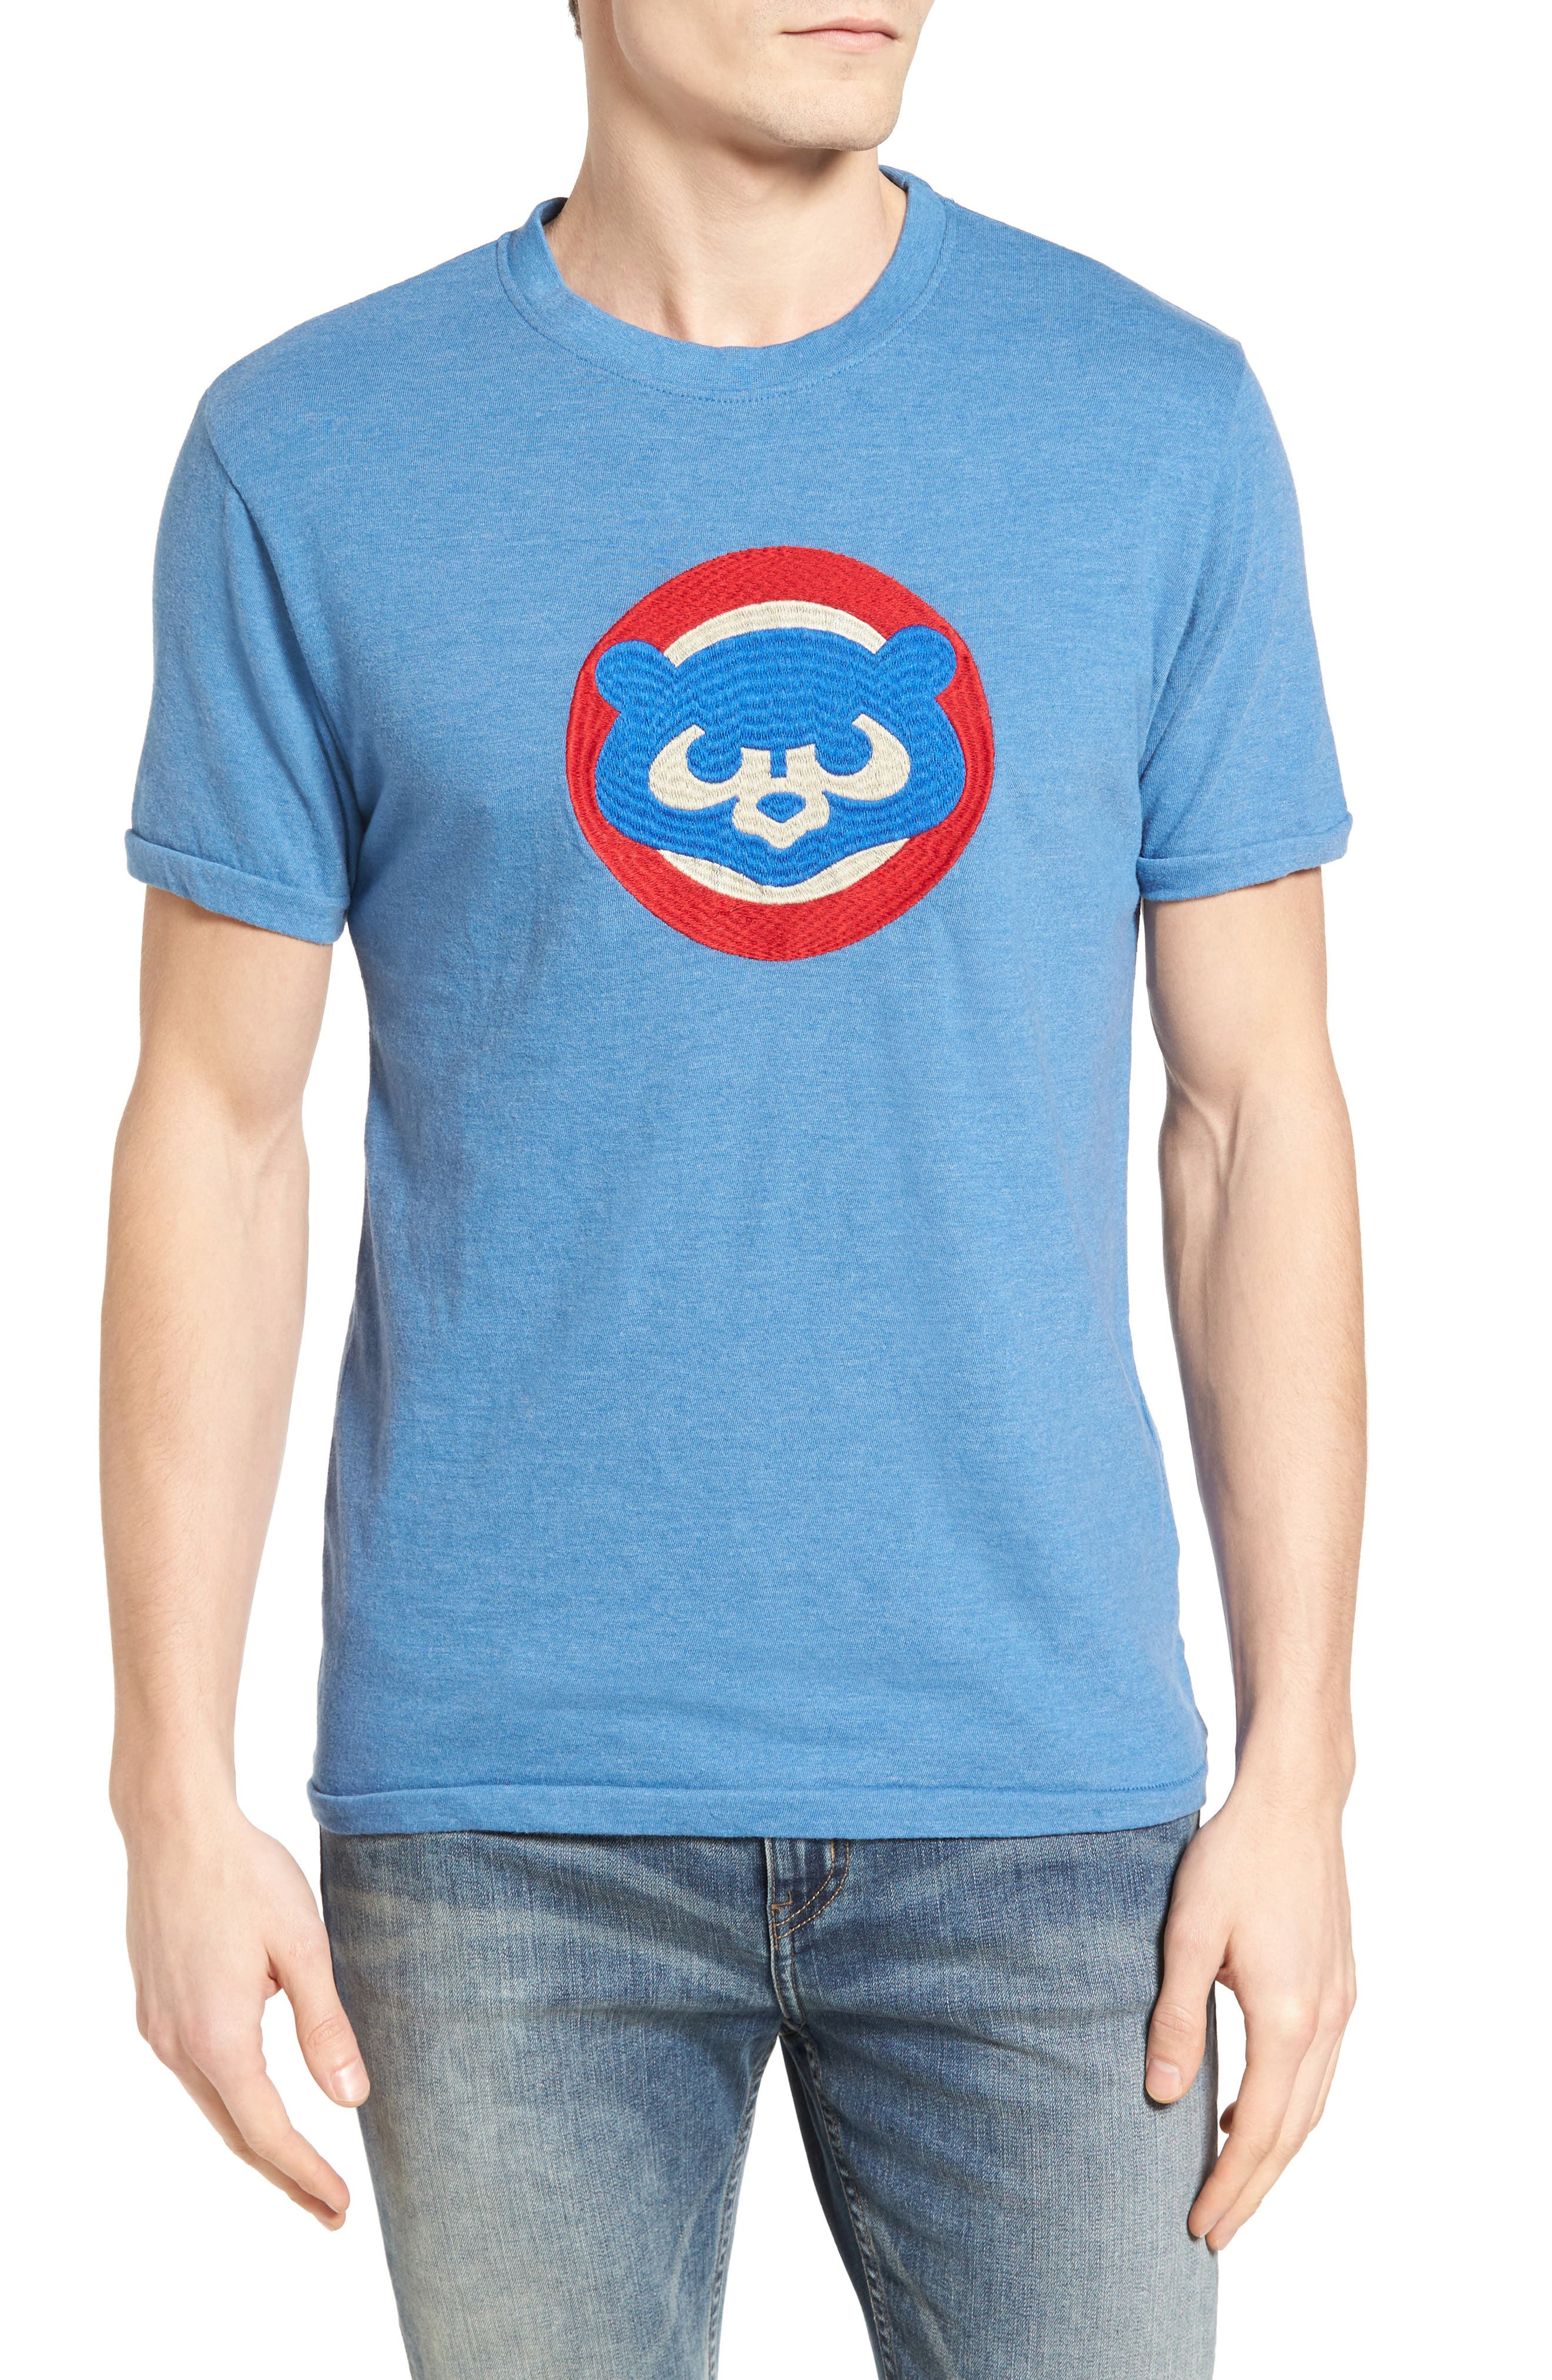 Hillwood Chicago Cubs T-Shirt,                         Main,                         color, 450